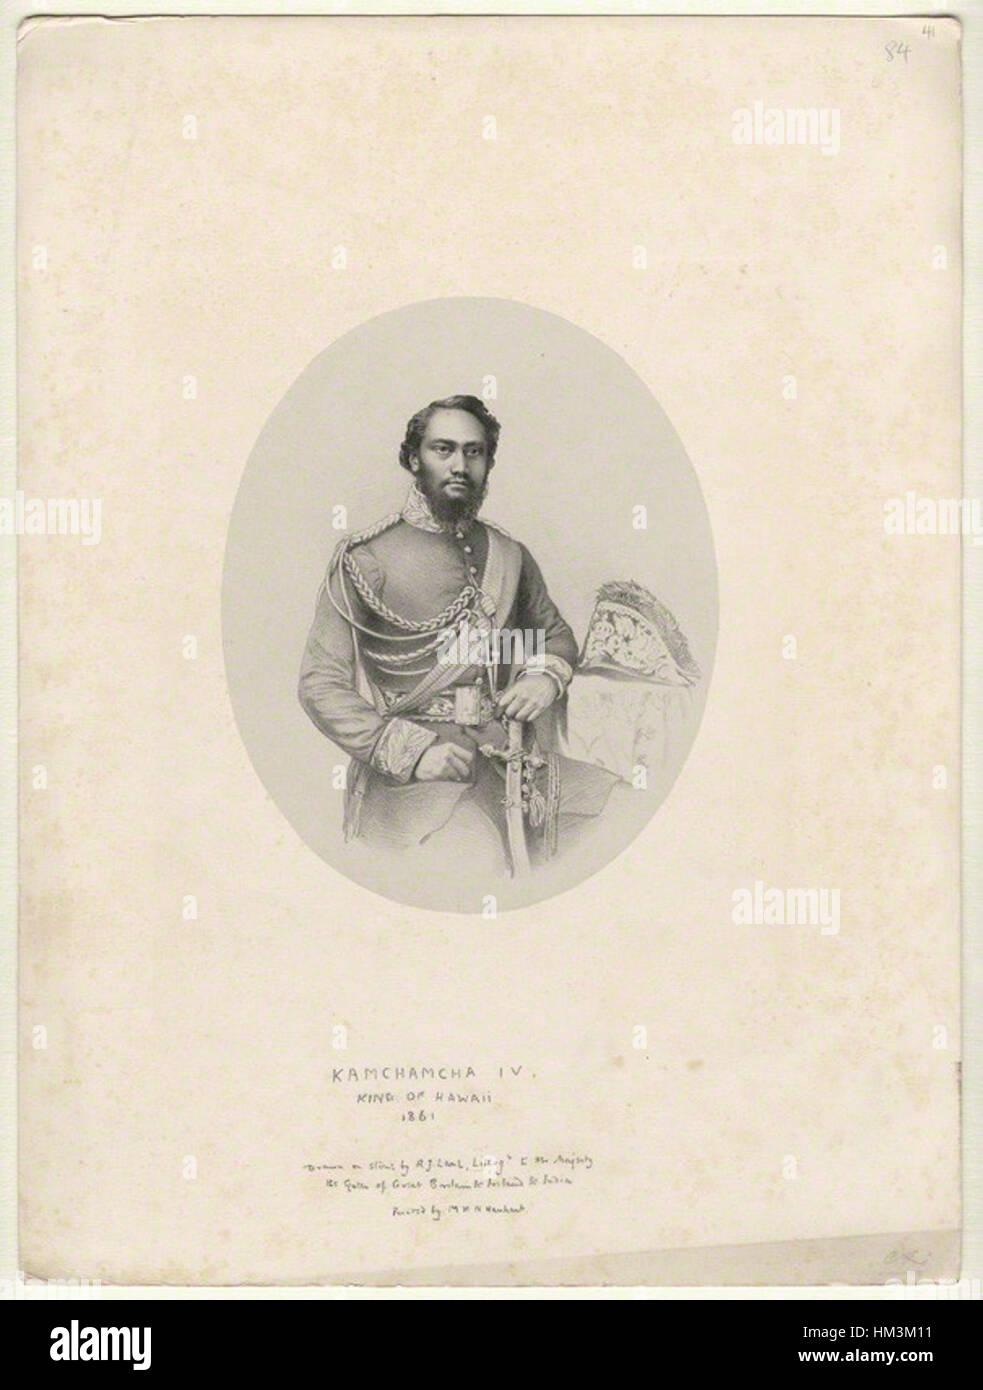 Kamehameha IV by Richard James Lane, lithograph, 1861 - Stock Image